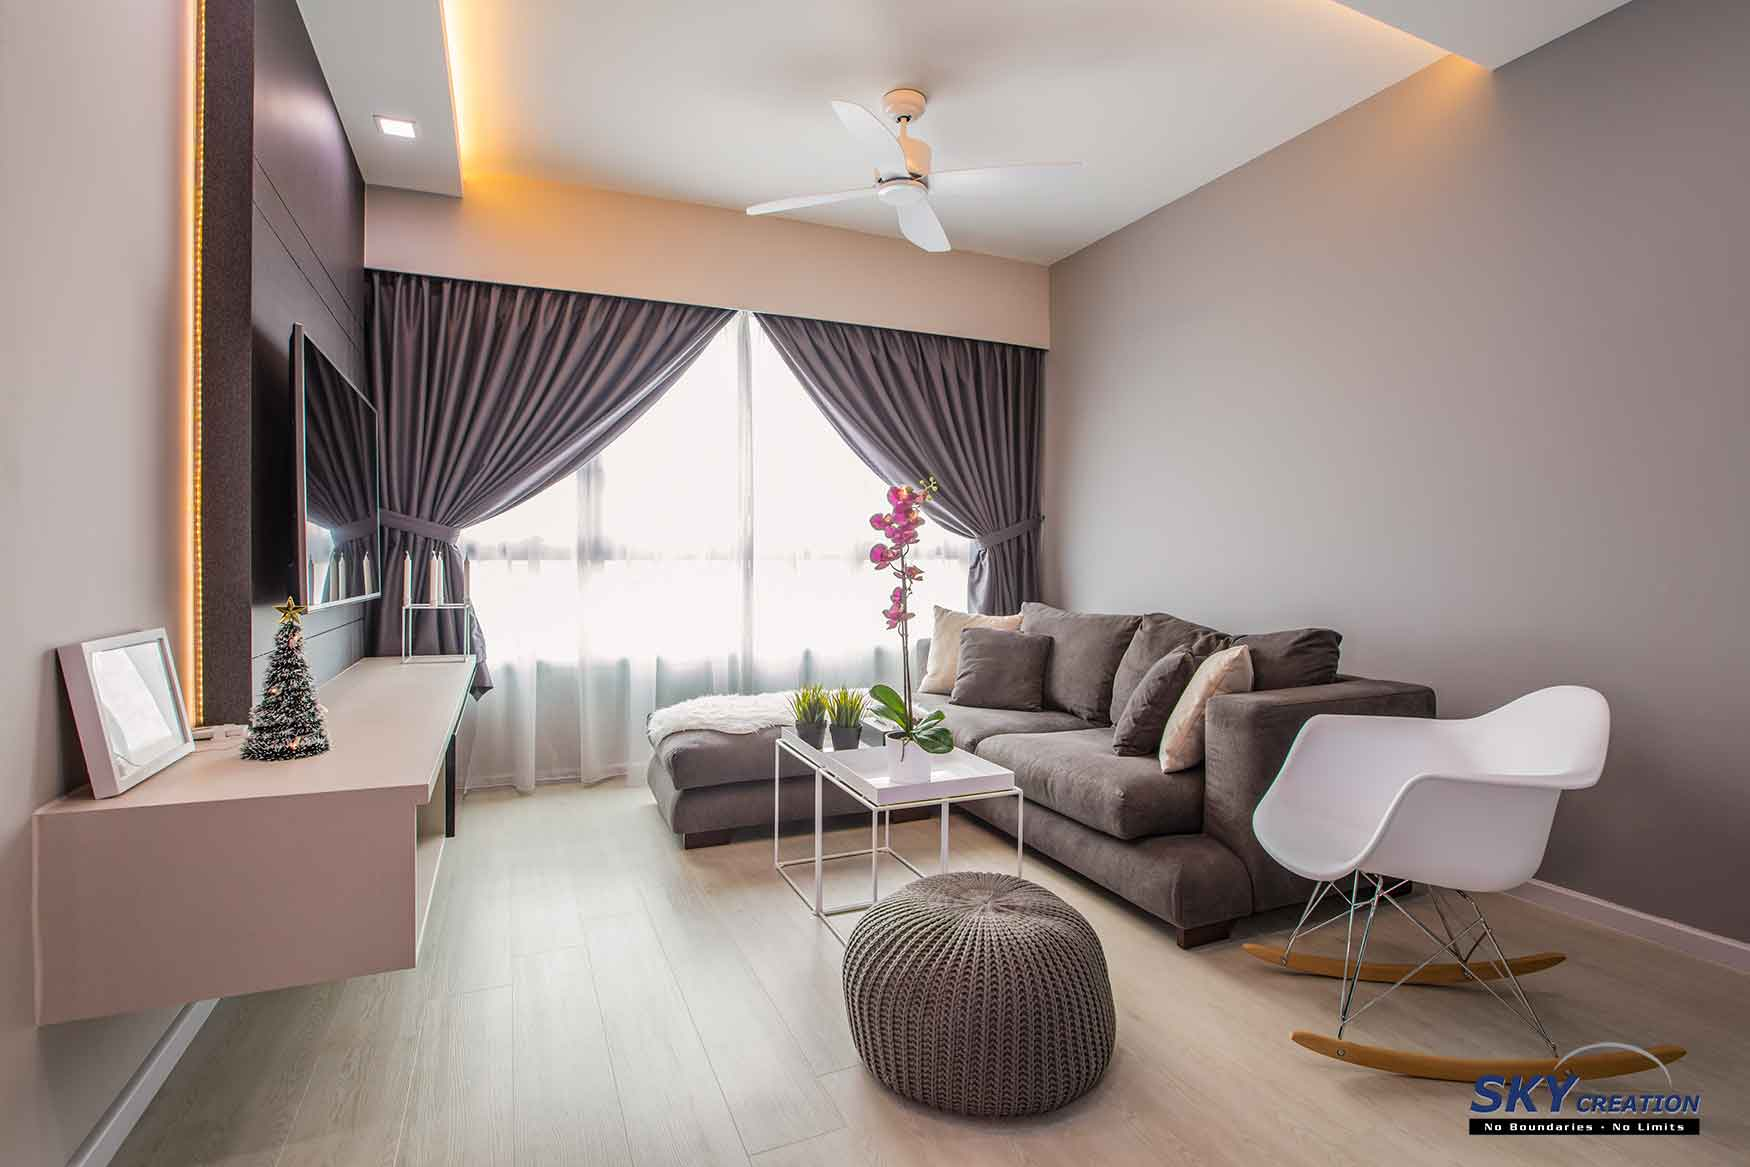 HDB 4 Room-Woodlands Drive 50 - Sky Creation   Singapore on Small:xmqi70Klvwi= Kitchen Renovation Ideas  id=67232